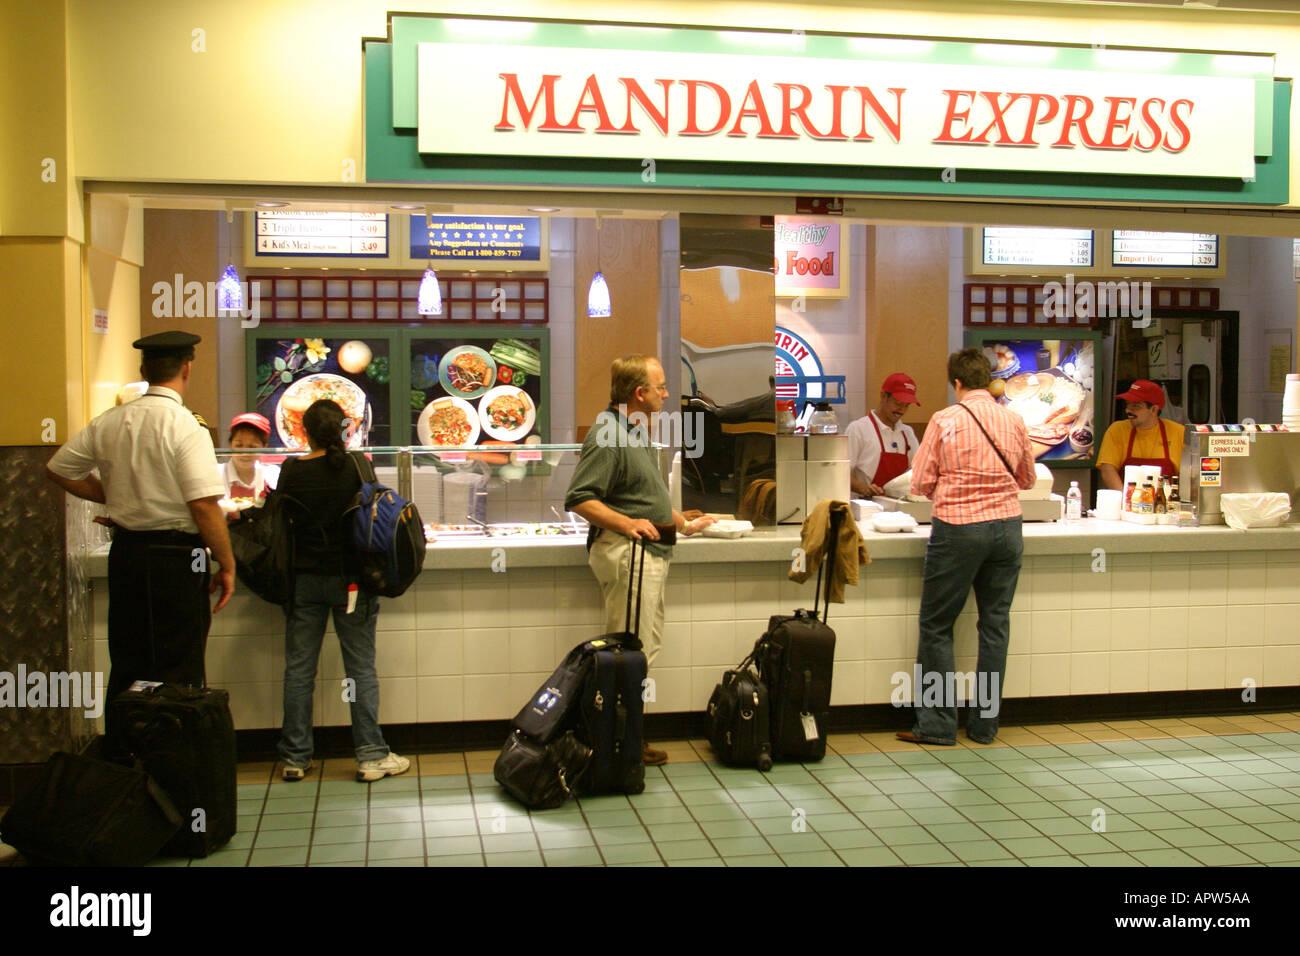 Best Restaurants Near Hartsfield Jackson Airport